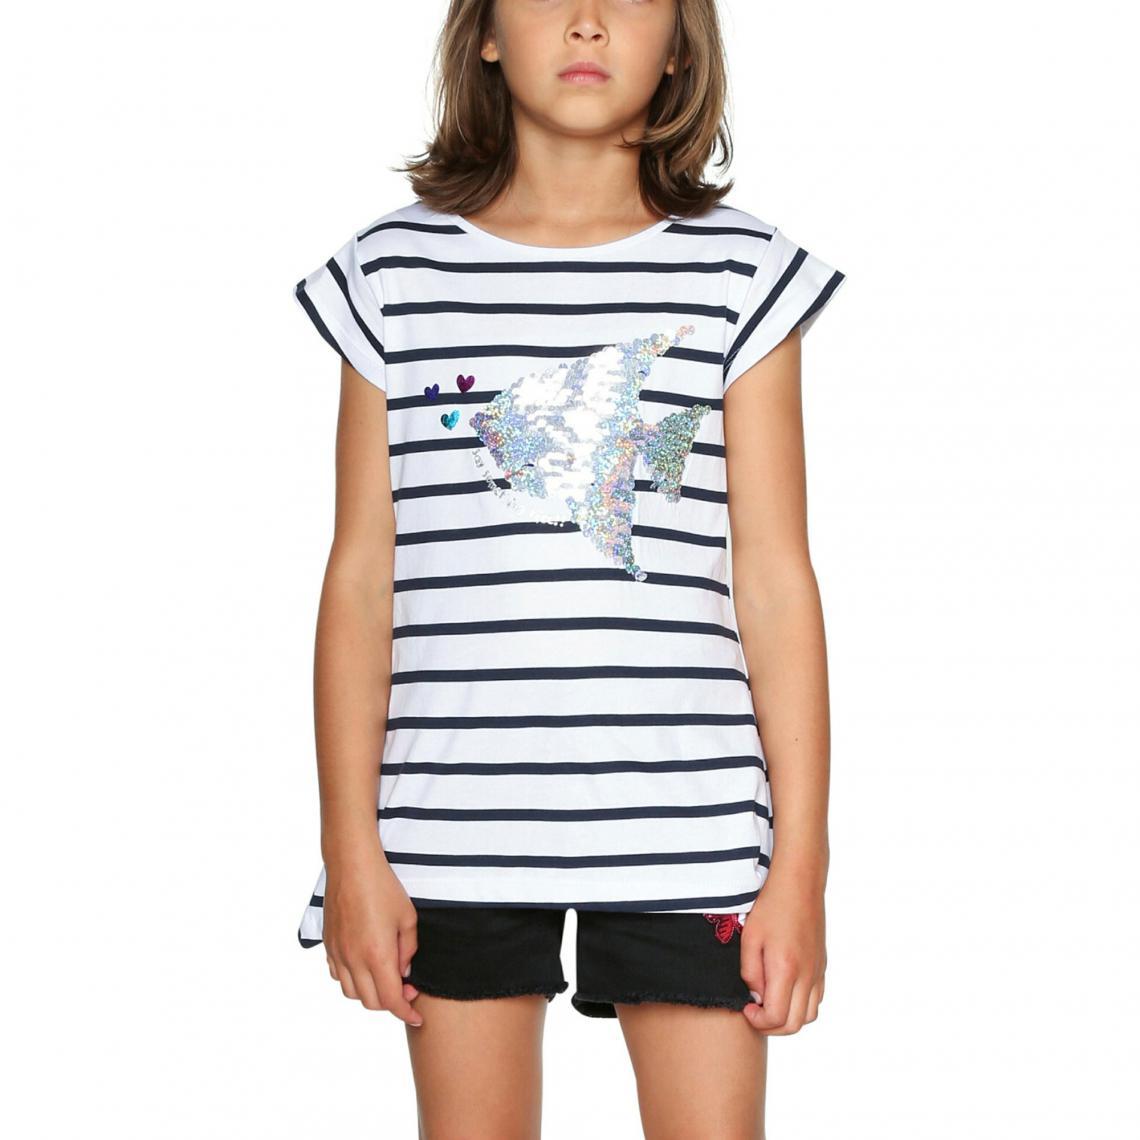 Tee-shirt rayé manches courtes fille Desigual